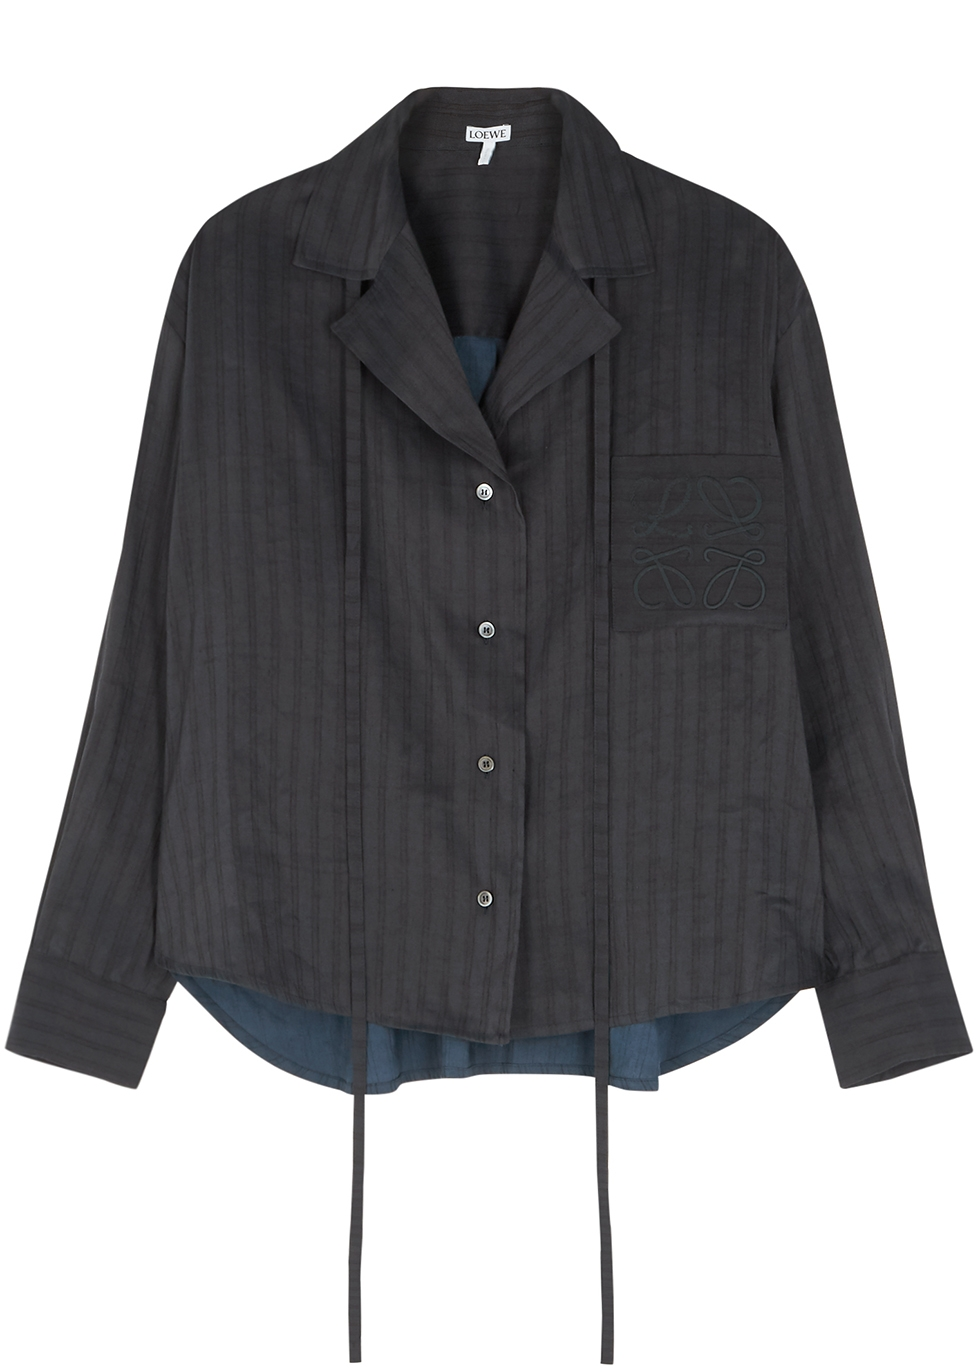 Navy striped linen-blend blouse